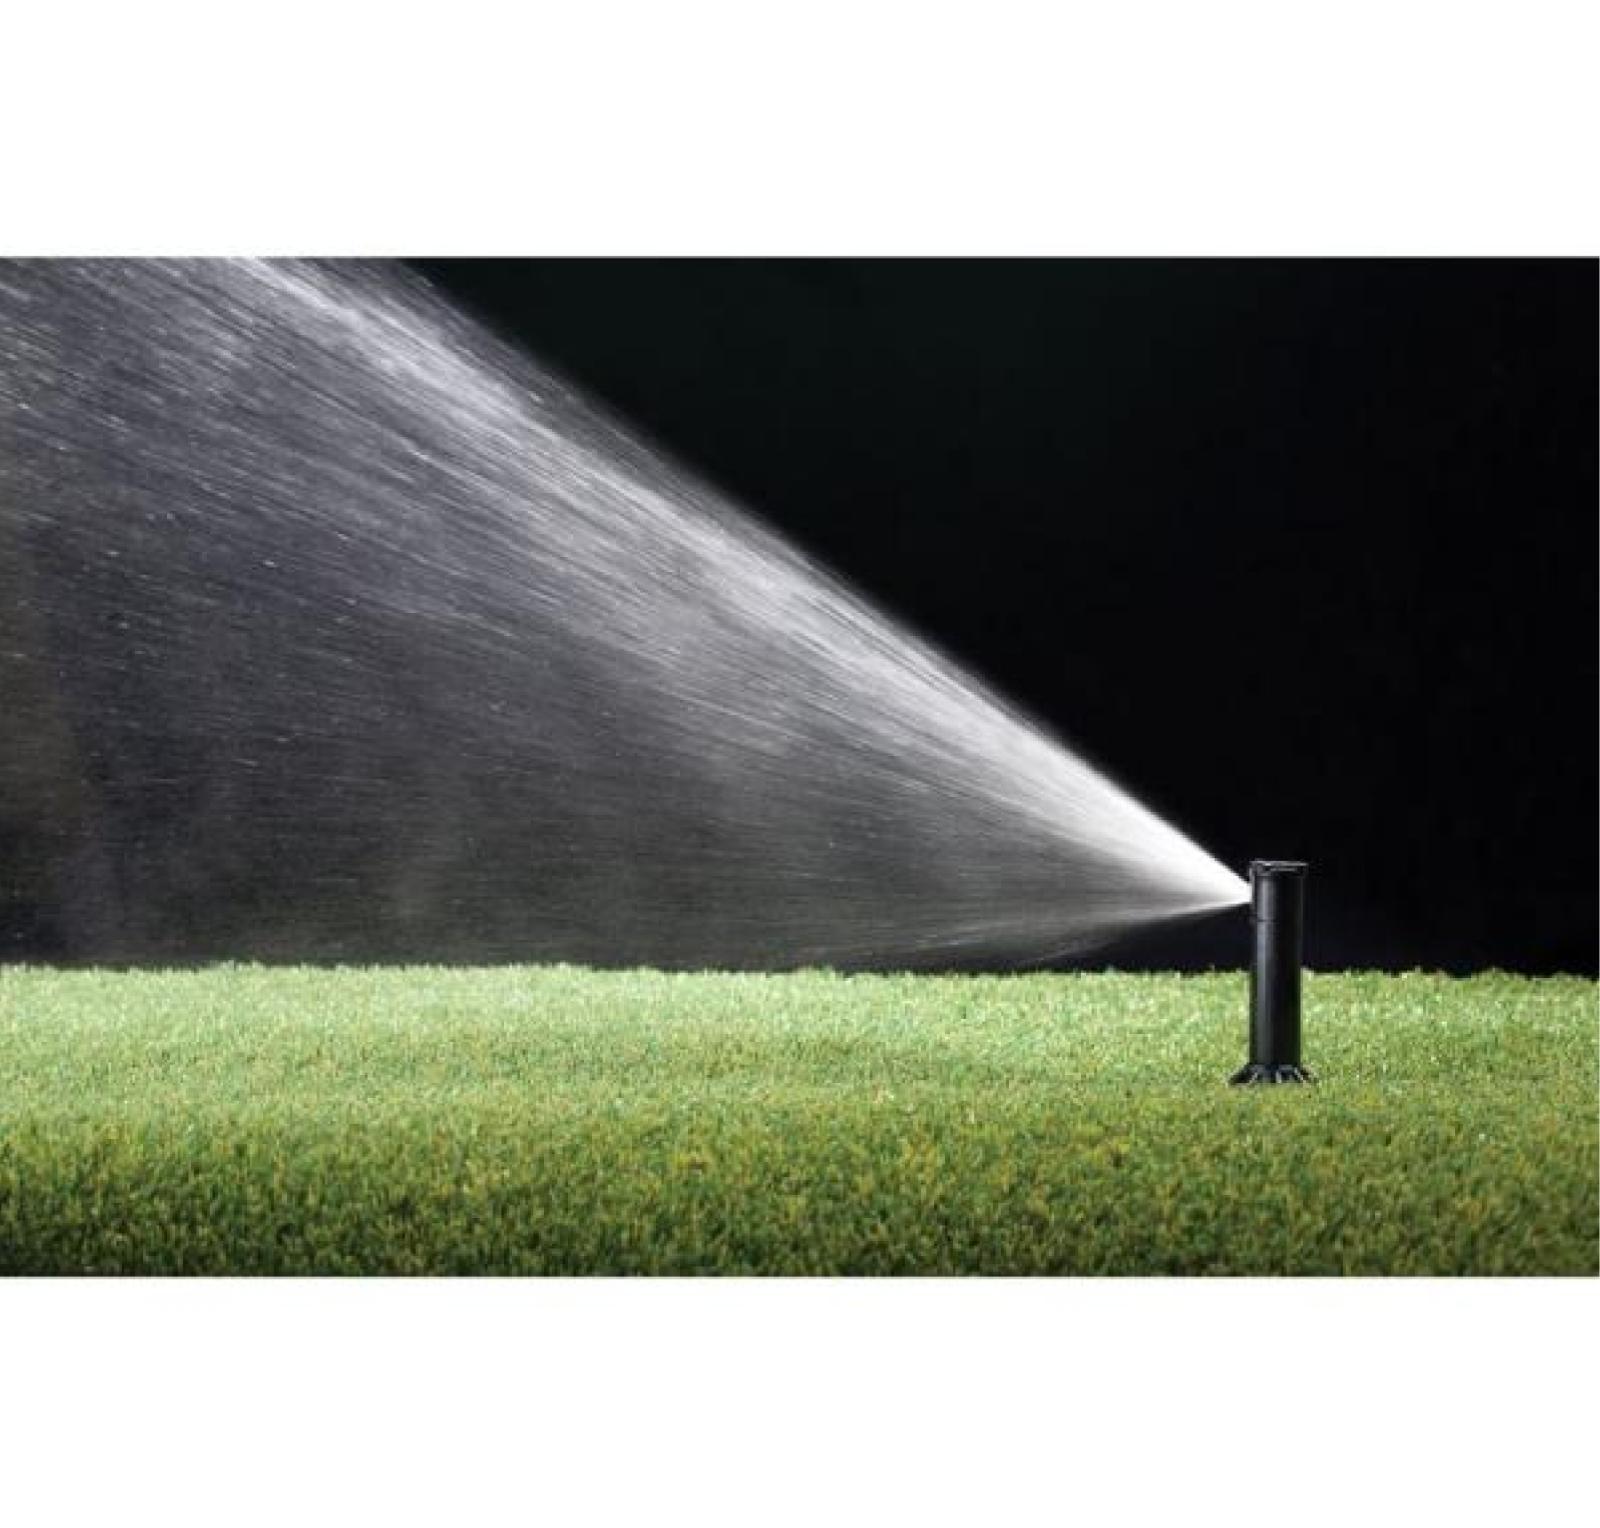 Gear Pop Sprinklers 19 Self-Flushing